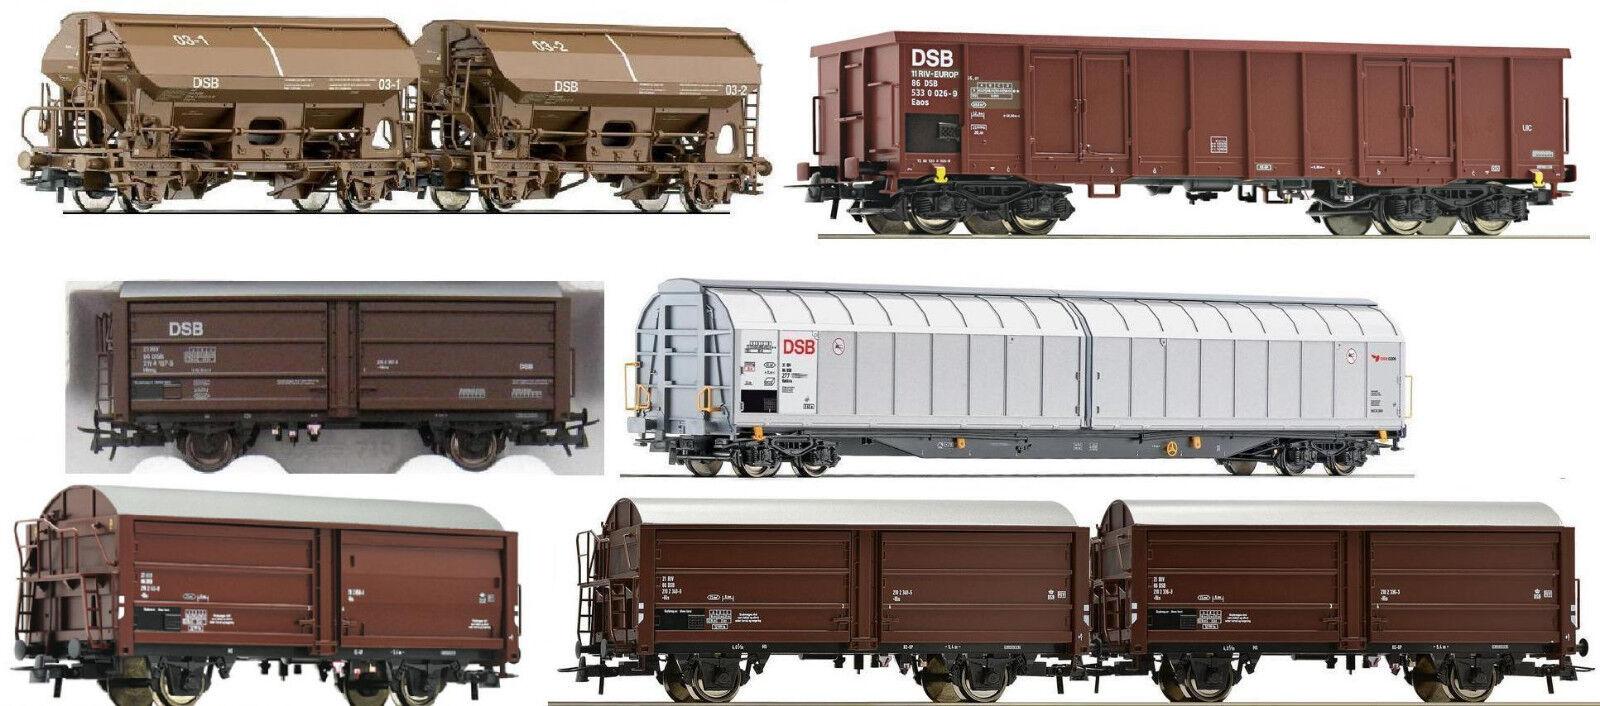 ROCO h0 8x DSB carri merci ep4-5 66020 76798 66925 66433 76995 67122 NUOVO a 62712